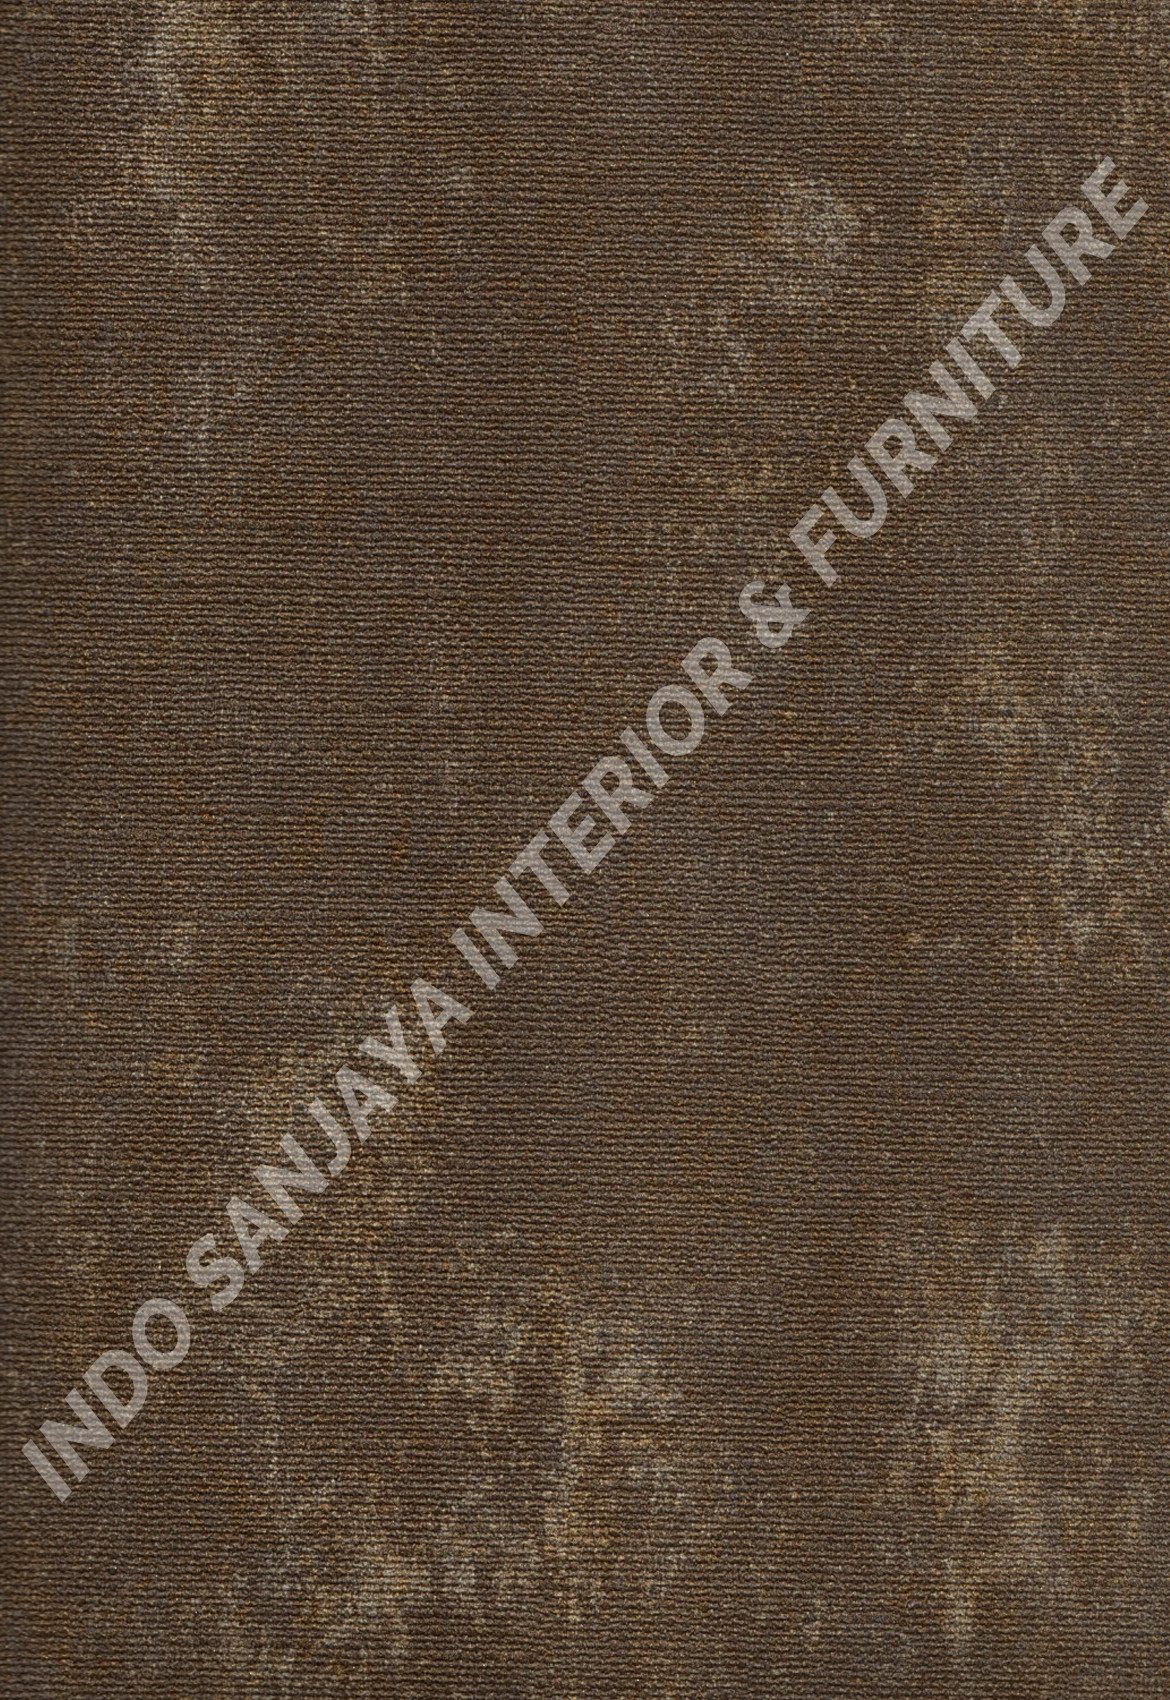 wallpaper   Wallpaper Minimalis Polos 13202:13202 corak  warna